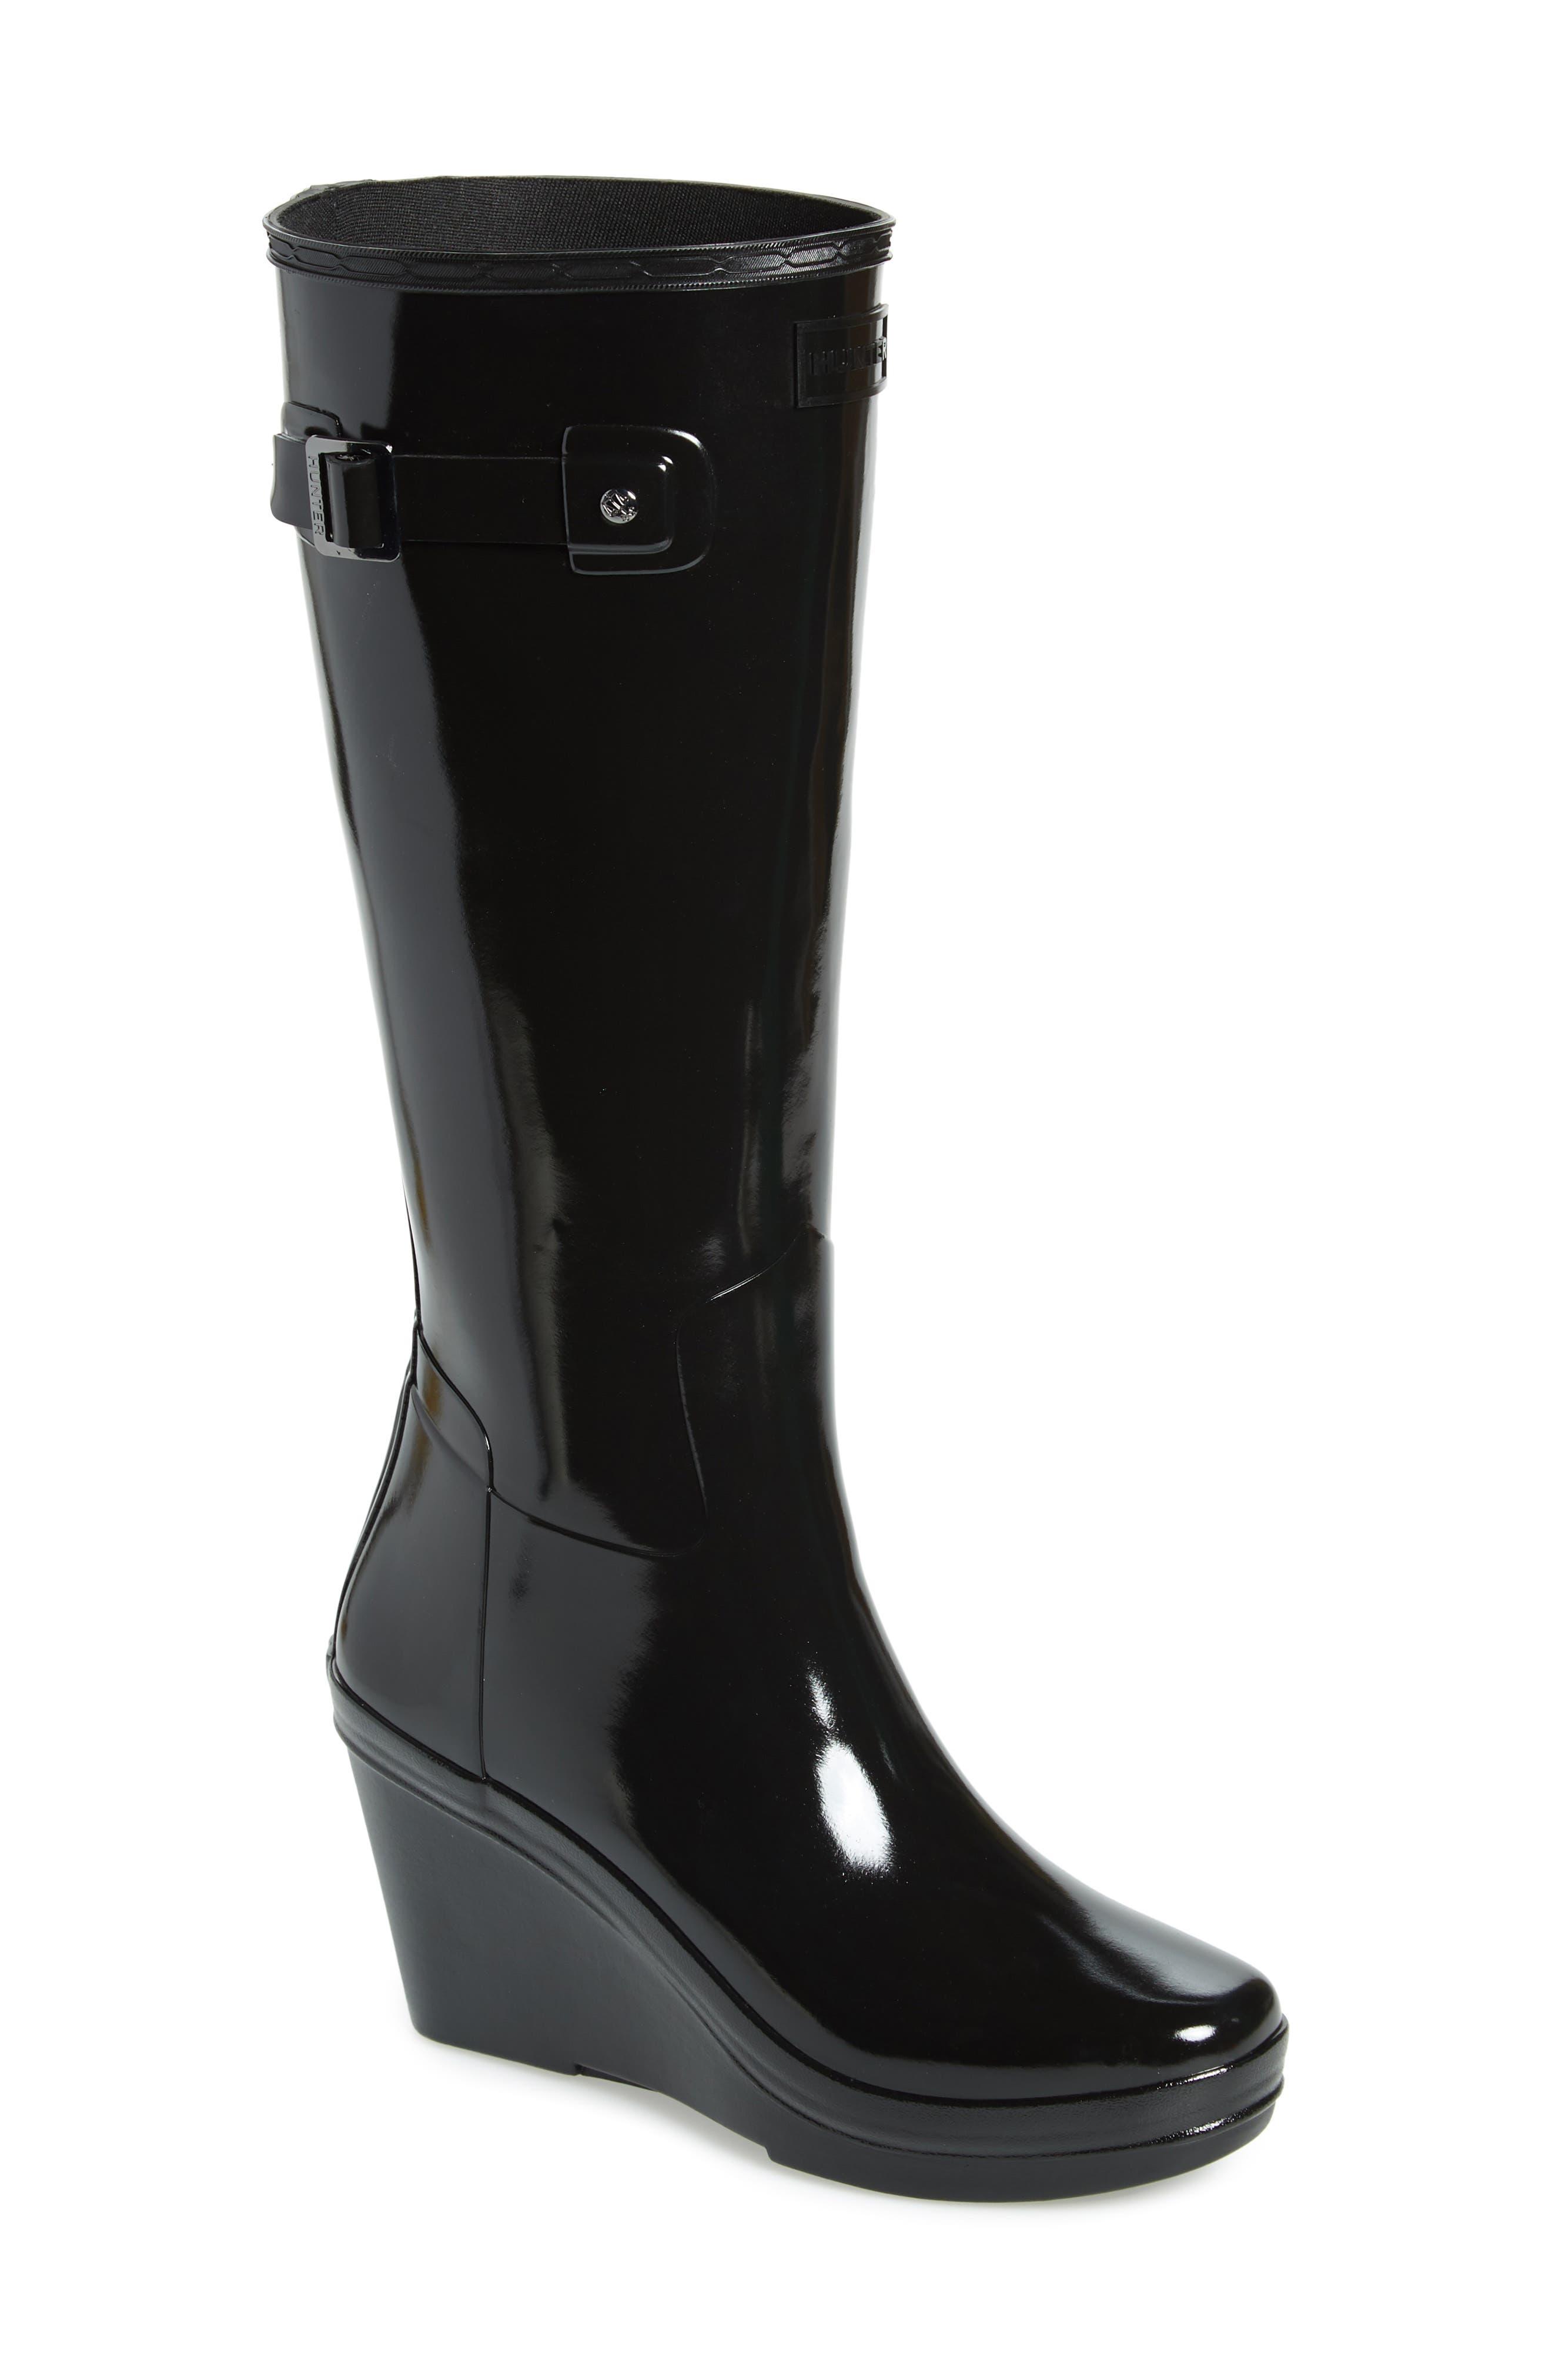 Refined Knee High Waterproof Rain Boot,                             Main thumbnail 1, color,                             BLACK